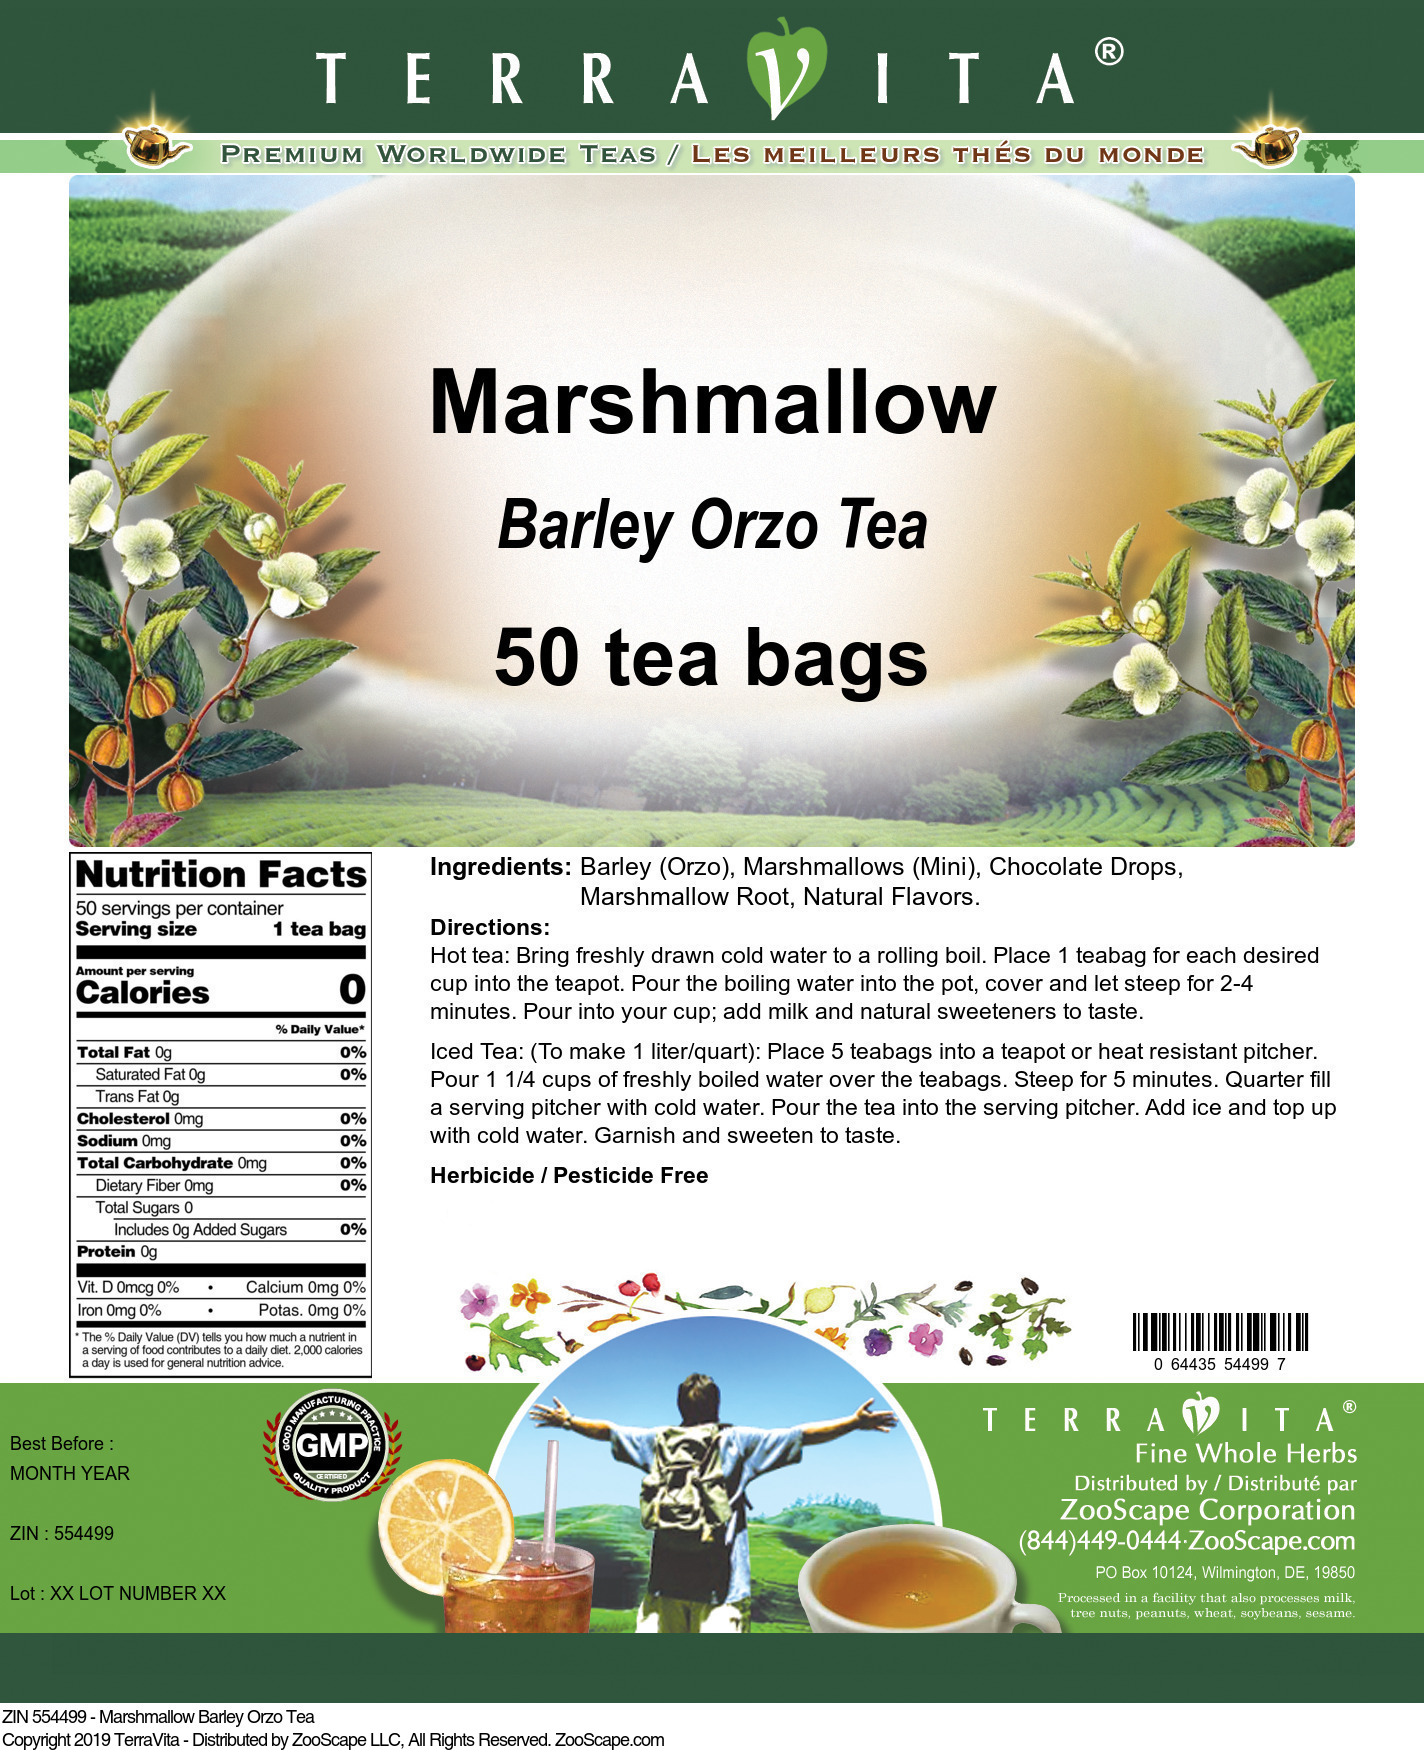 Marshmallow Barley Orzo Tea